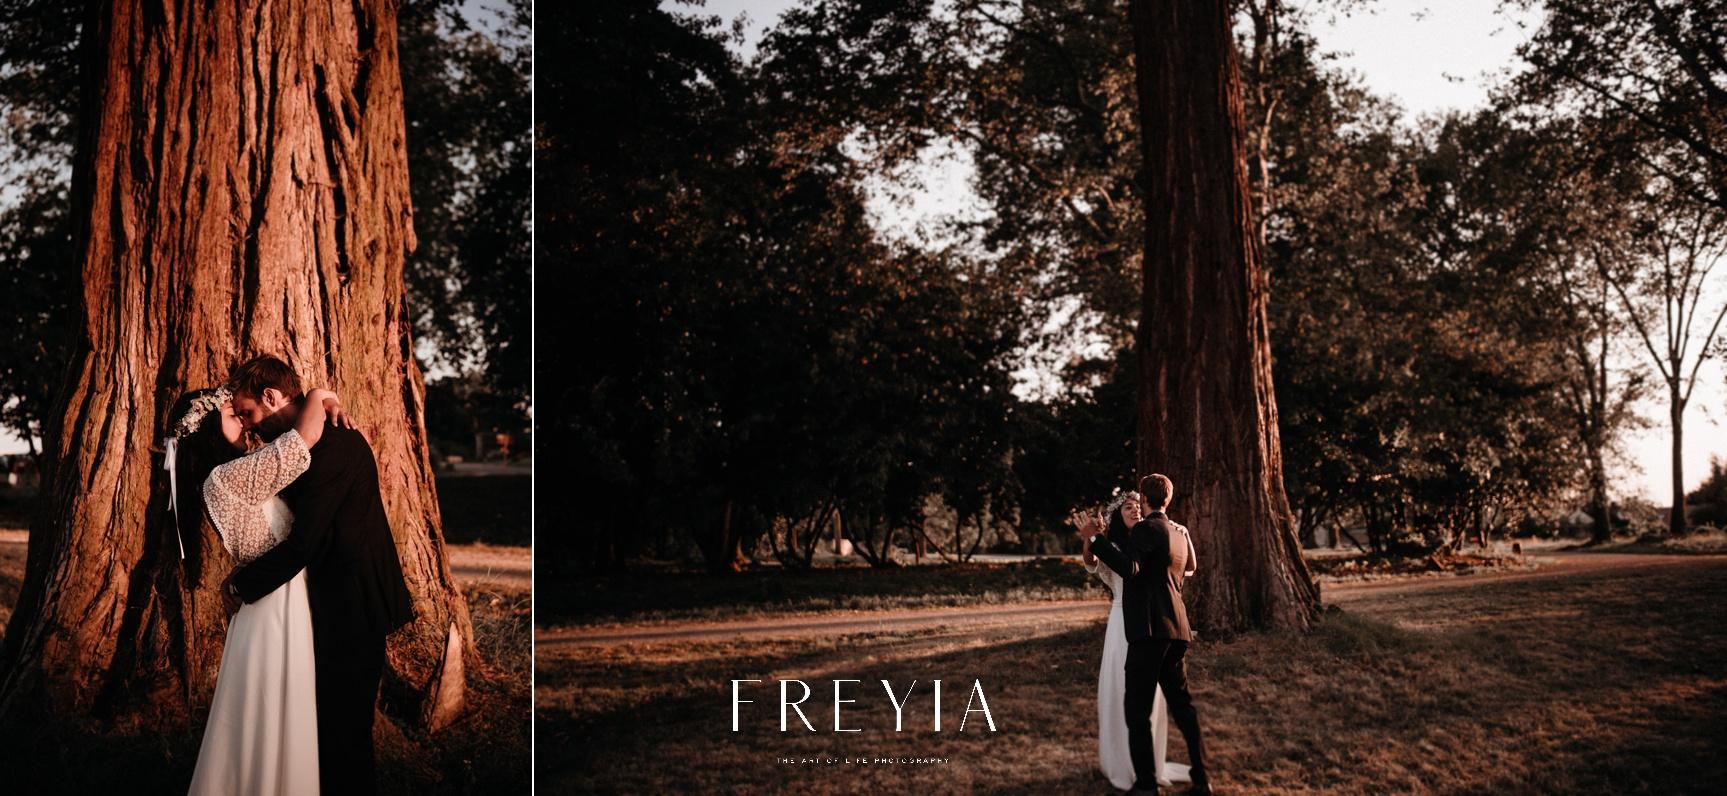 R + T |  mariage reportage alternatif moody intime minimaliste vintage naturel boho boheme |  PHOTOGRAPHE mariage PARIS france destination  | FREYIA photography_-326.jpg